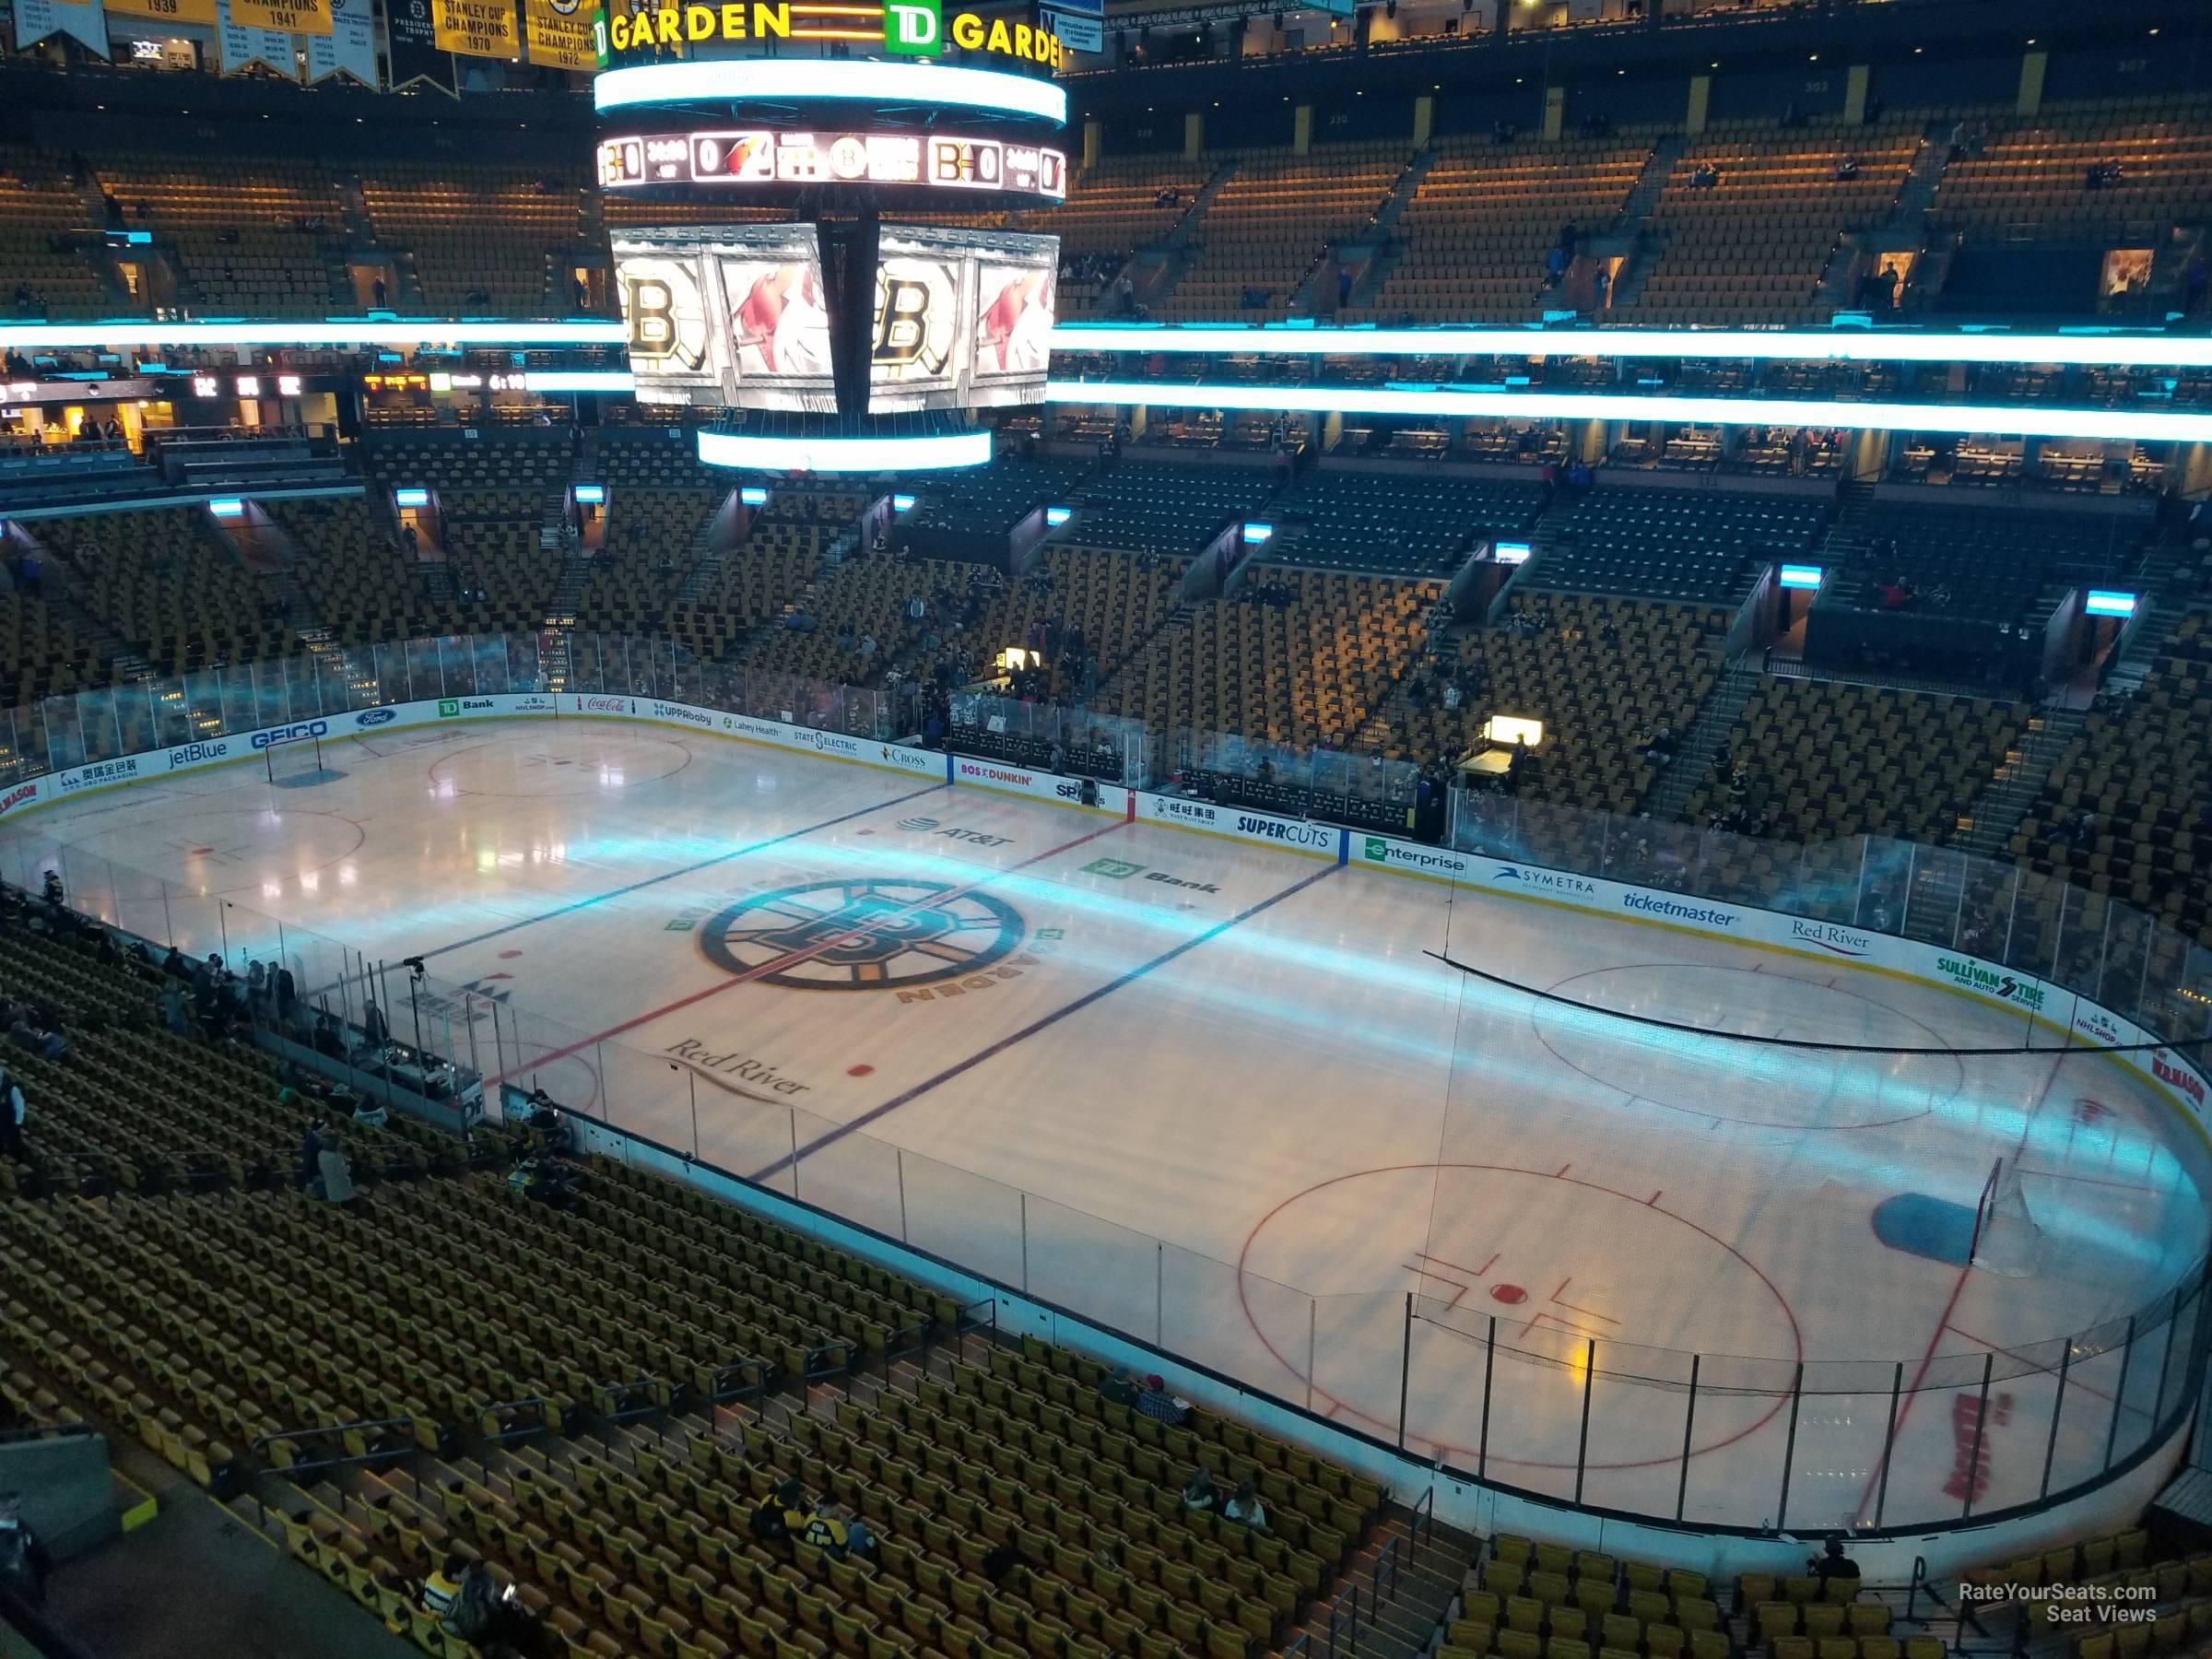 Td Garden Section 313 Boston Bruins Rateyourseats Com